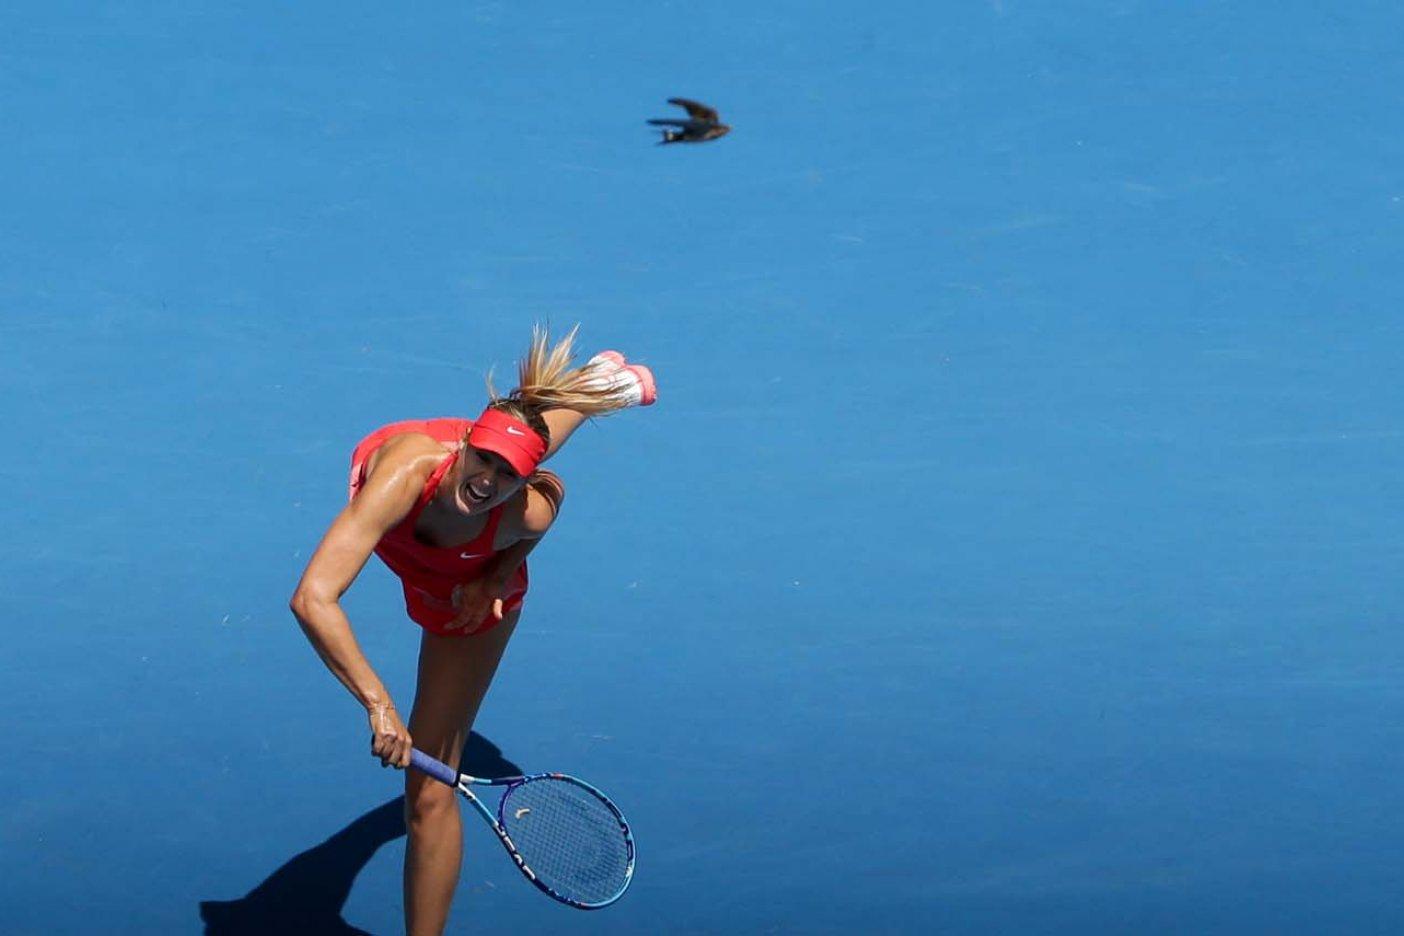 Sharapova recibe wild card para jugar el US Open